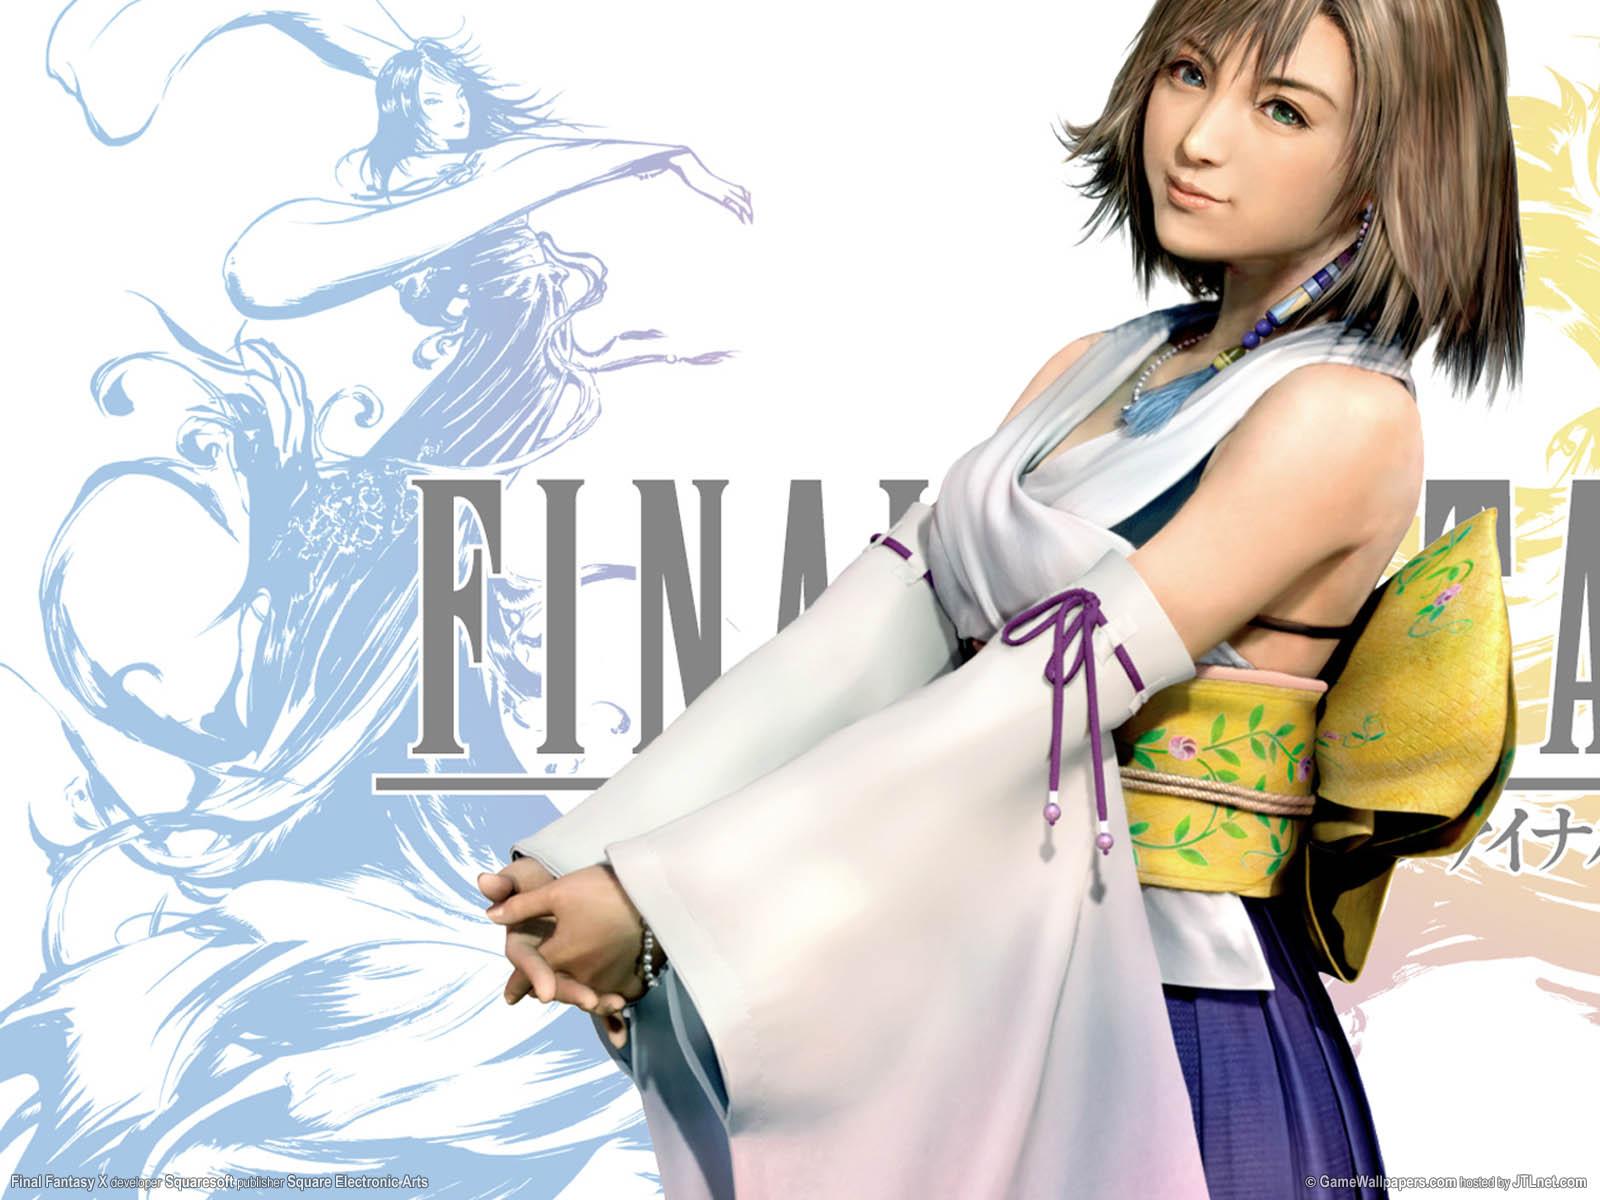 Final Fantasy Xνmmer=01 wallpaper  1600x1200